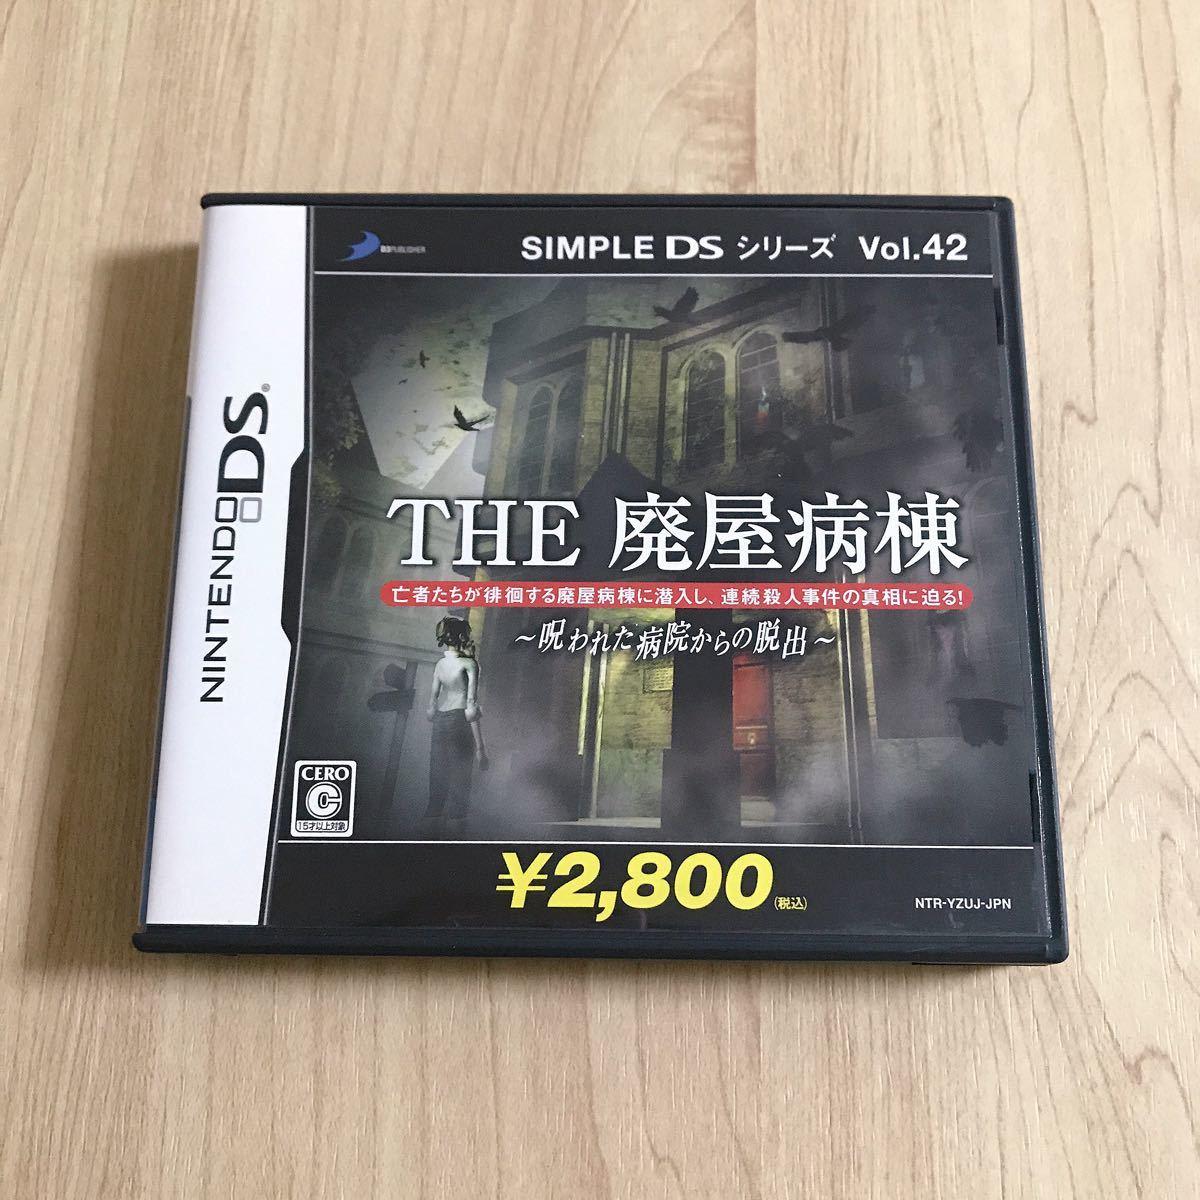 DS ソフト SIMPLE DSシリーズVol.42 THE廃屋病棟